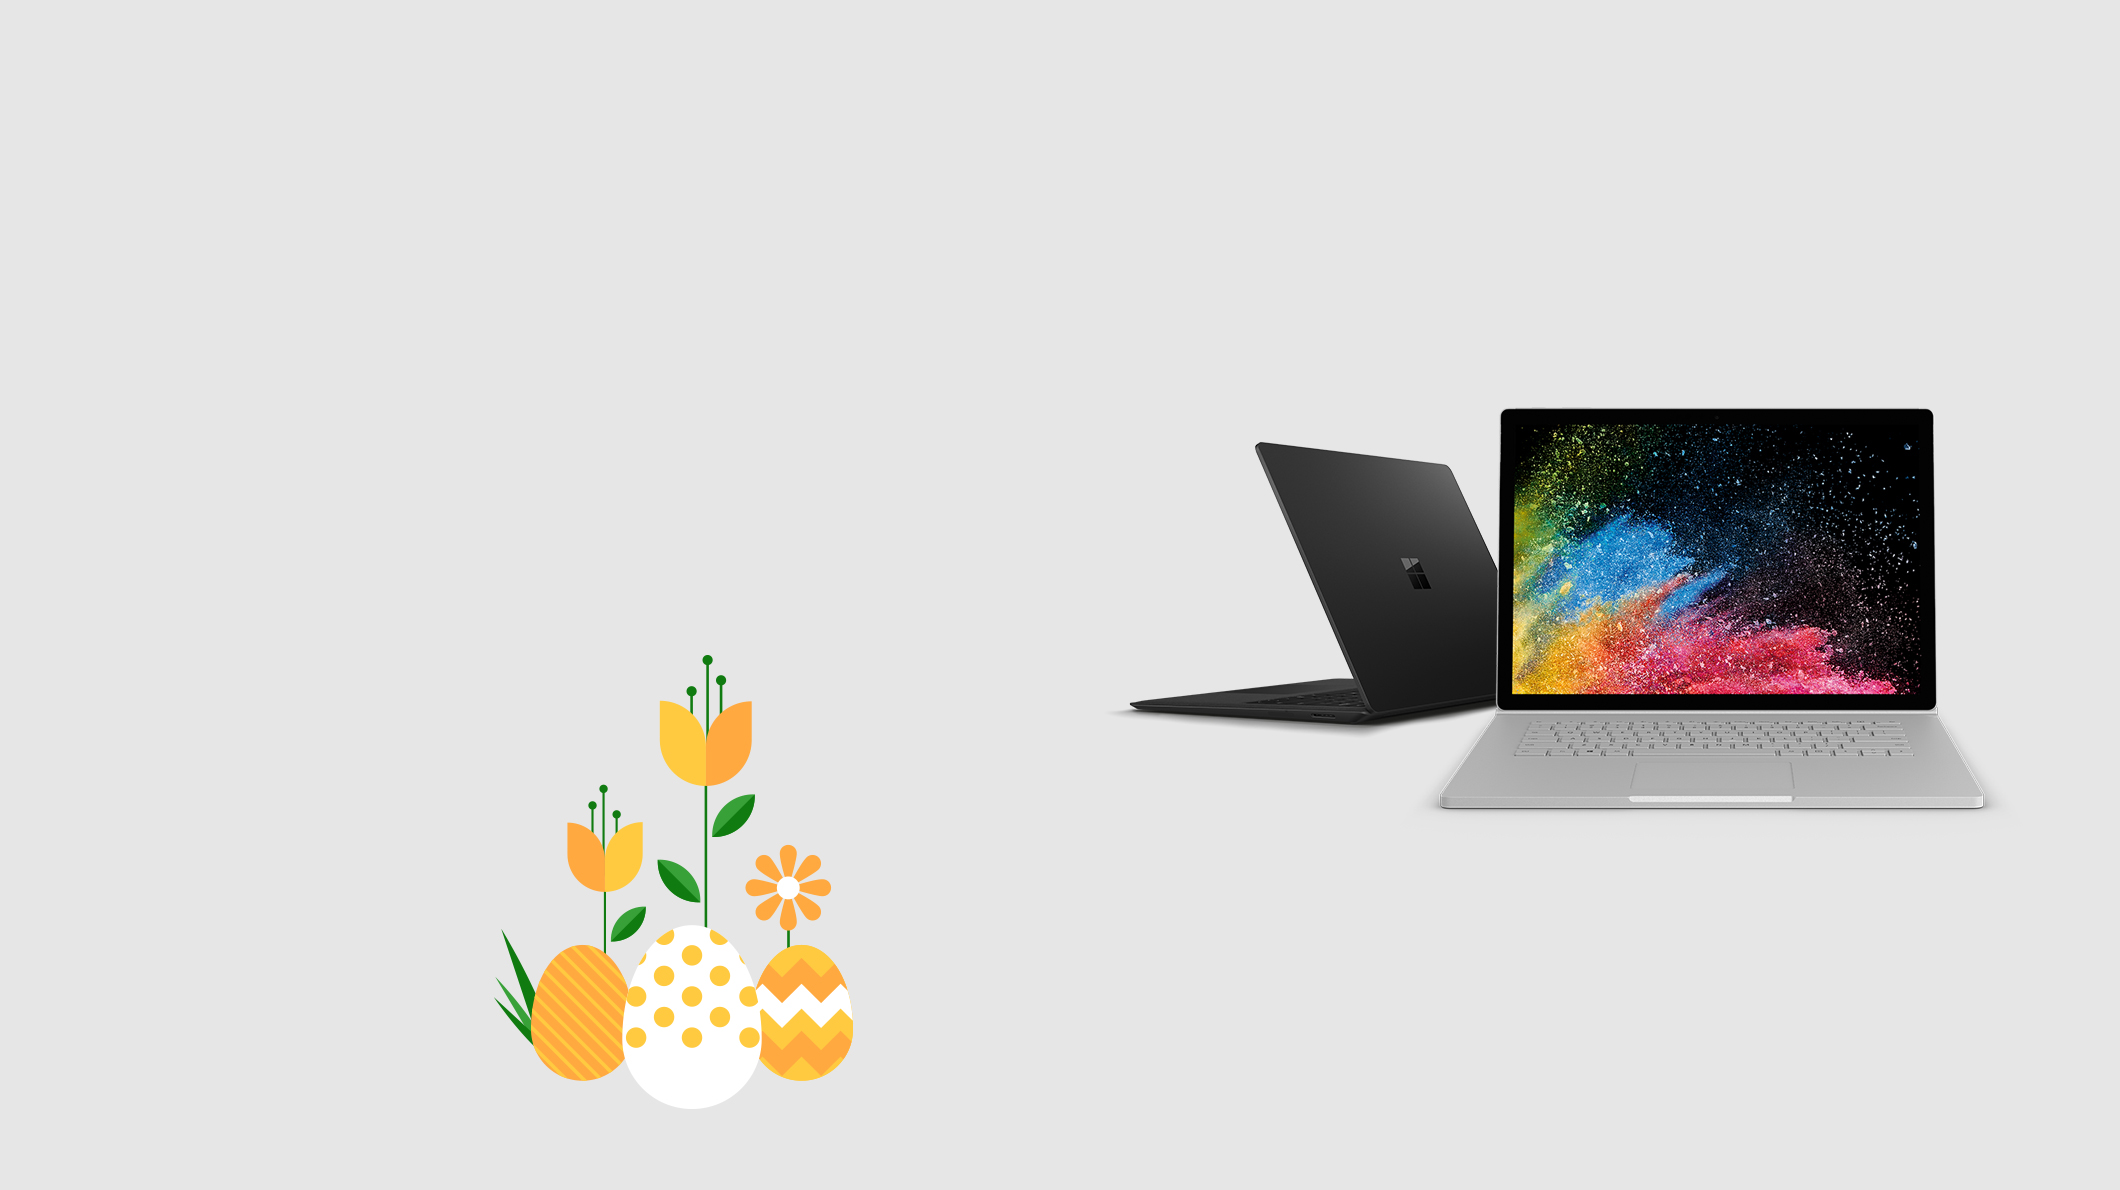 Surface Book 2, Surface Laptop 2